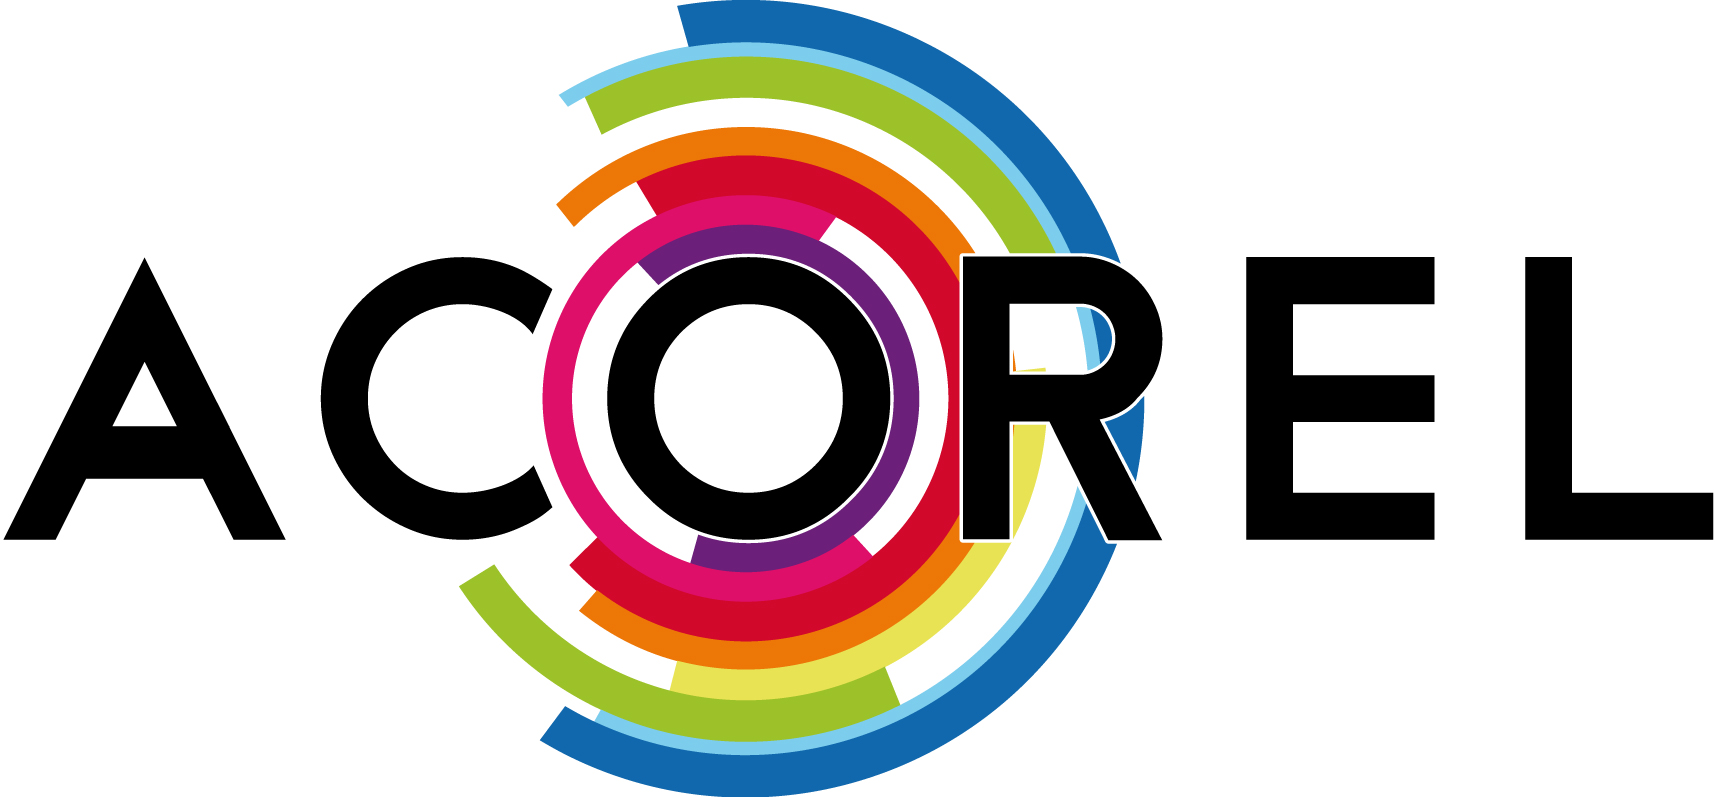 Acorel logo